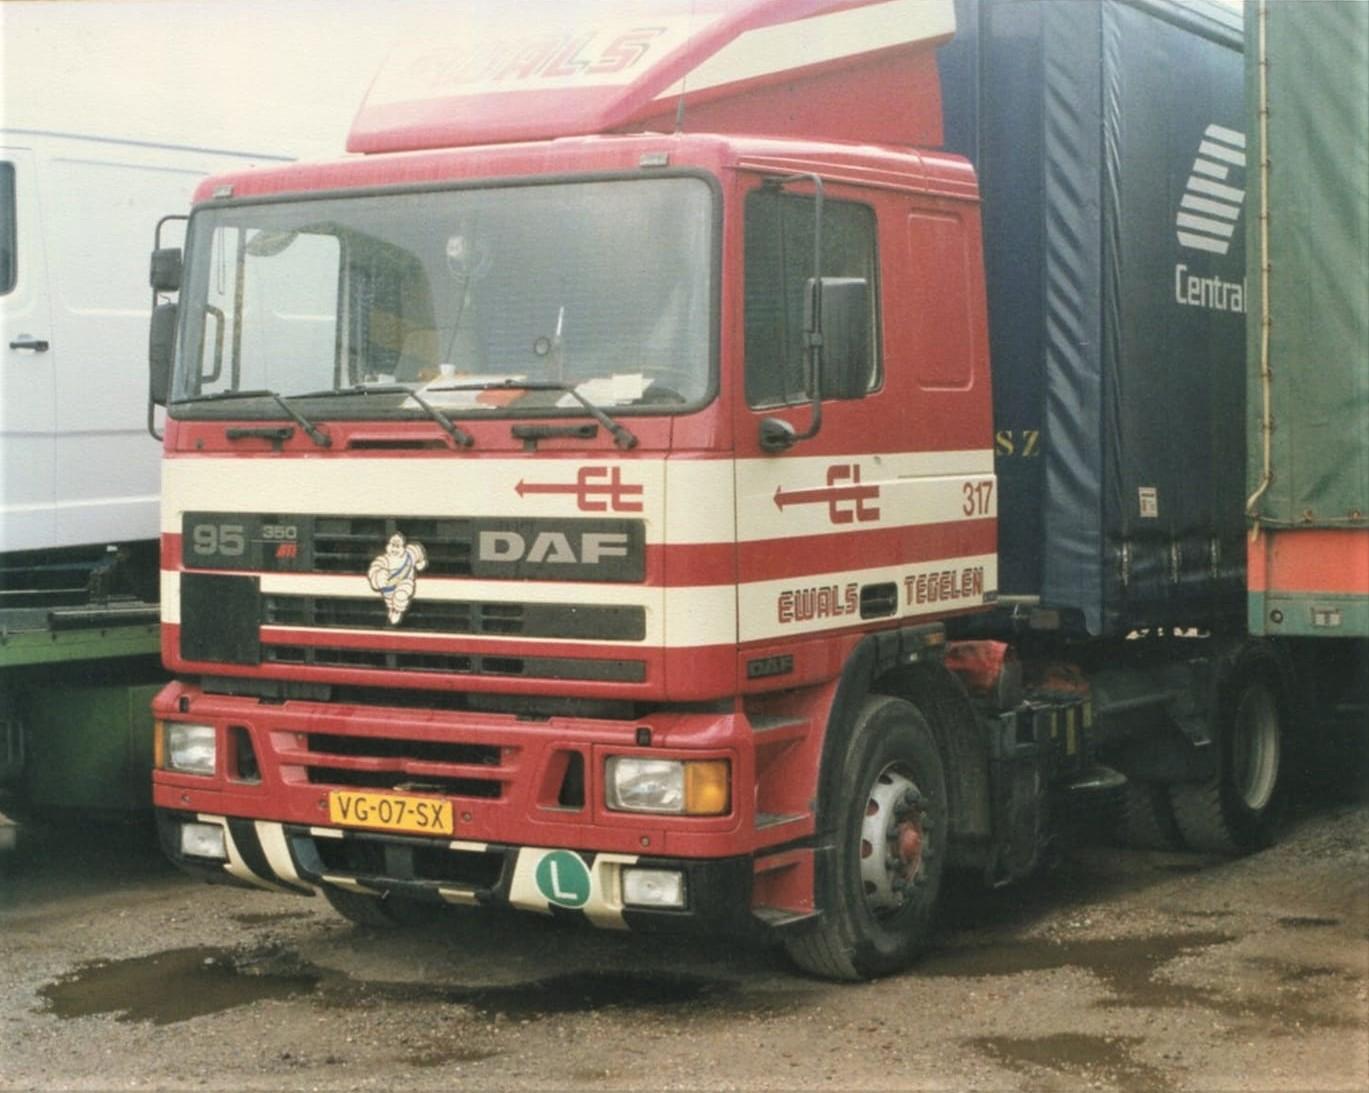 DAF-FT-95-350-ATi----317--VG-07-SX--Herman-vd-kerkhof-en-jan-janssen-uit-deurne-hebben-er-oa-mee-gereden-foto-Frank-Coumans